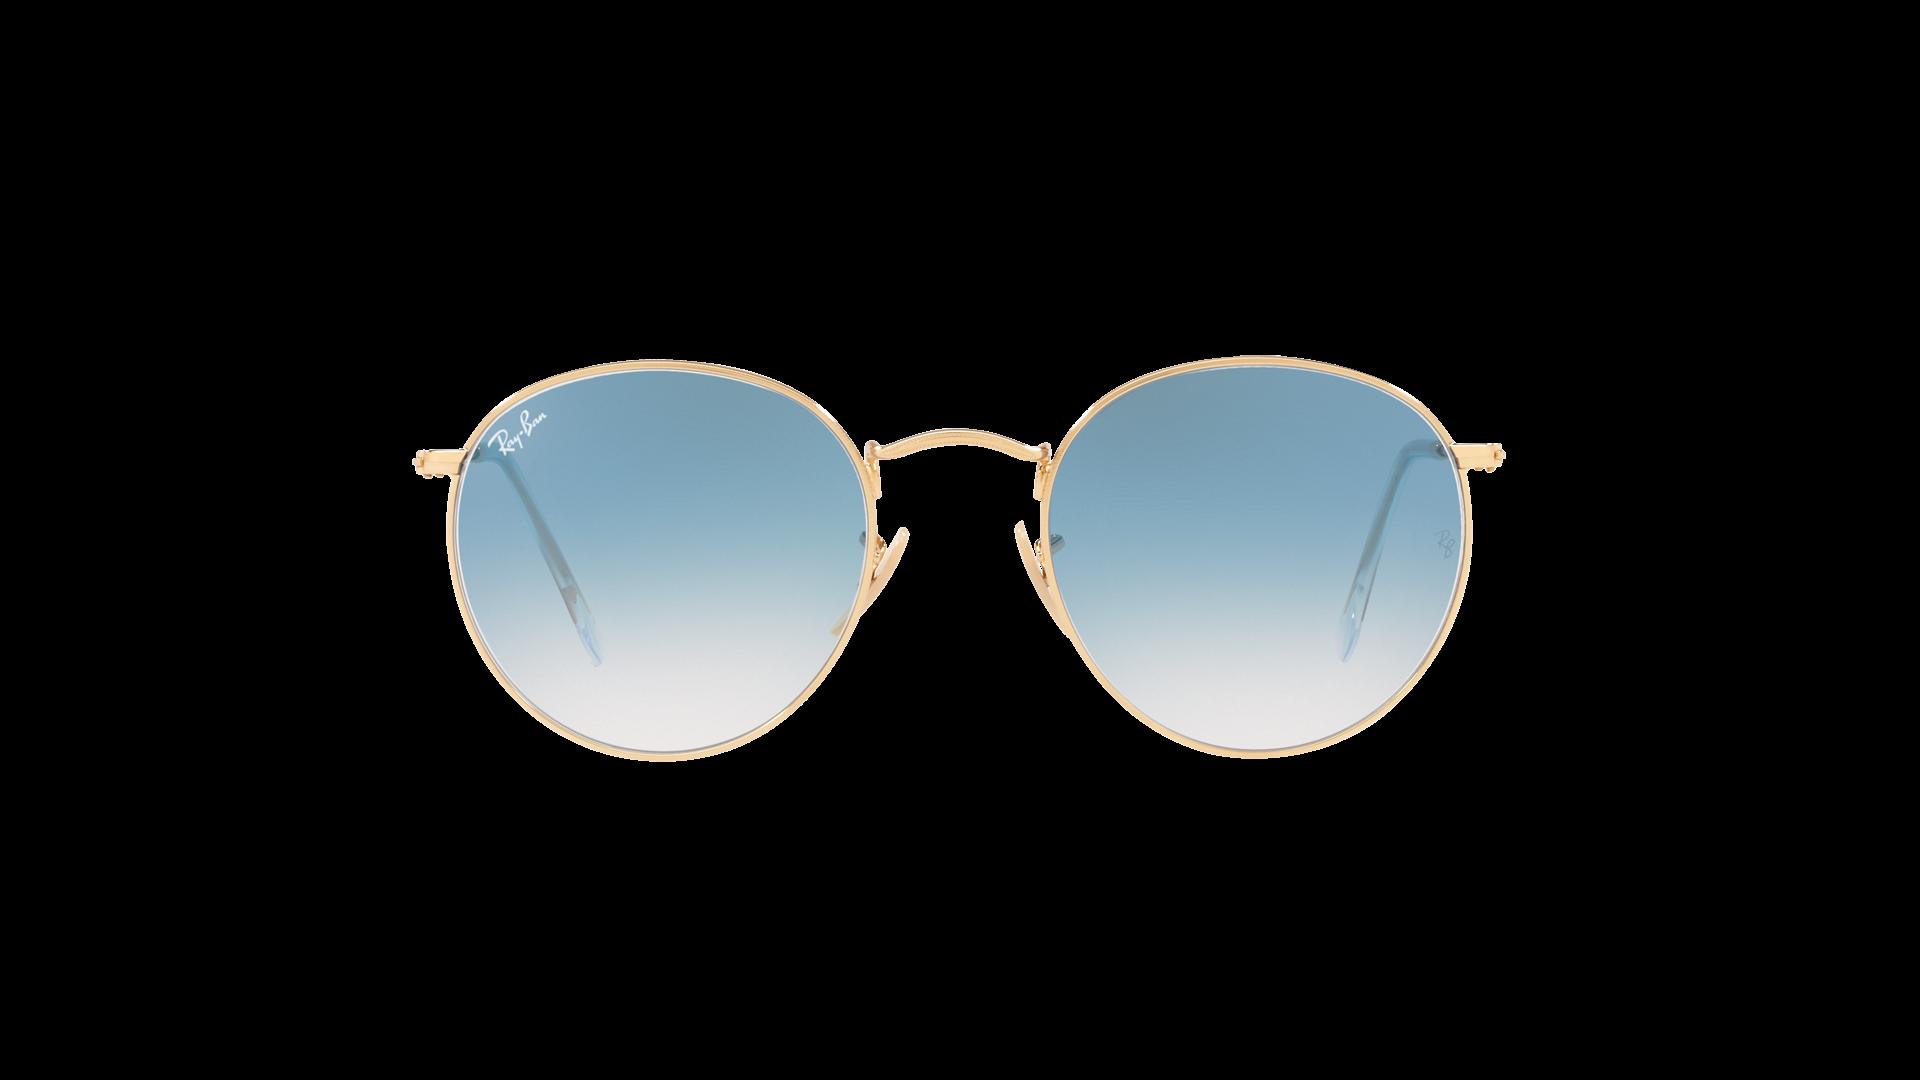 4b407f5f224 Sunglasses Ray-Ban Round metal Flat Lenses Gold RB3447N 001 3F 50-21 Medium  Gradient